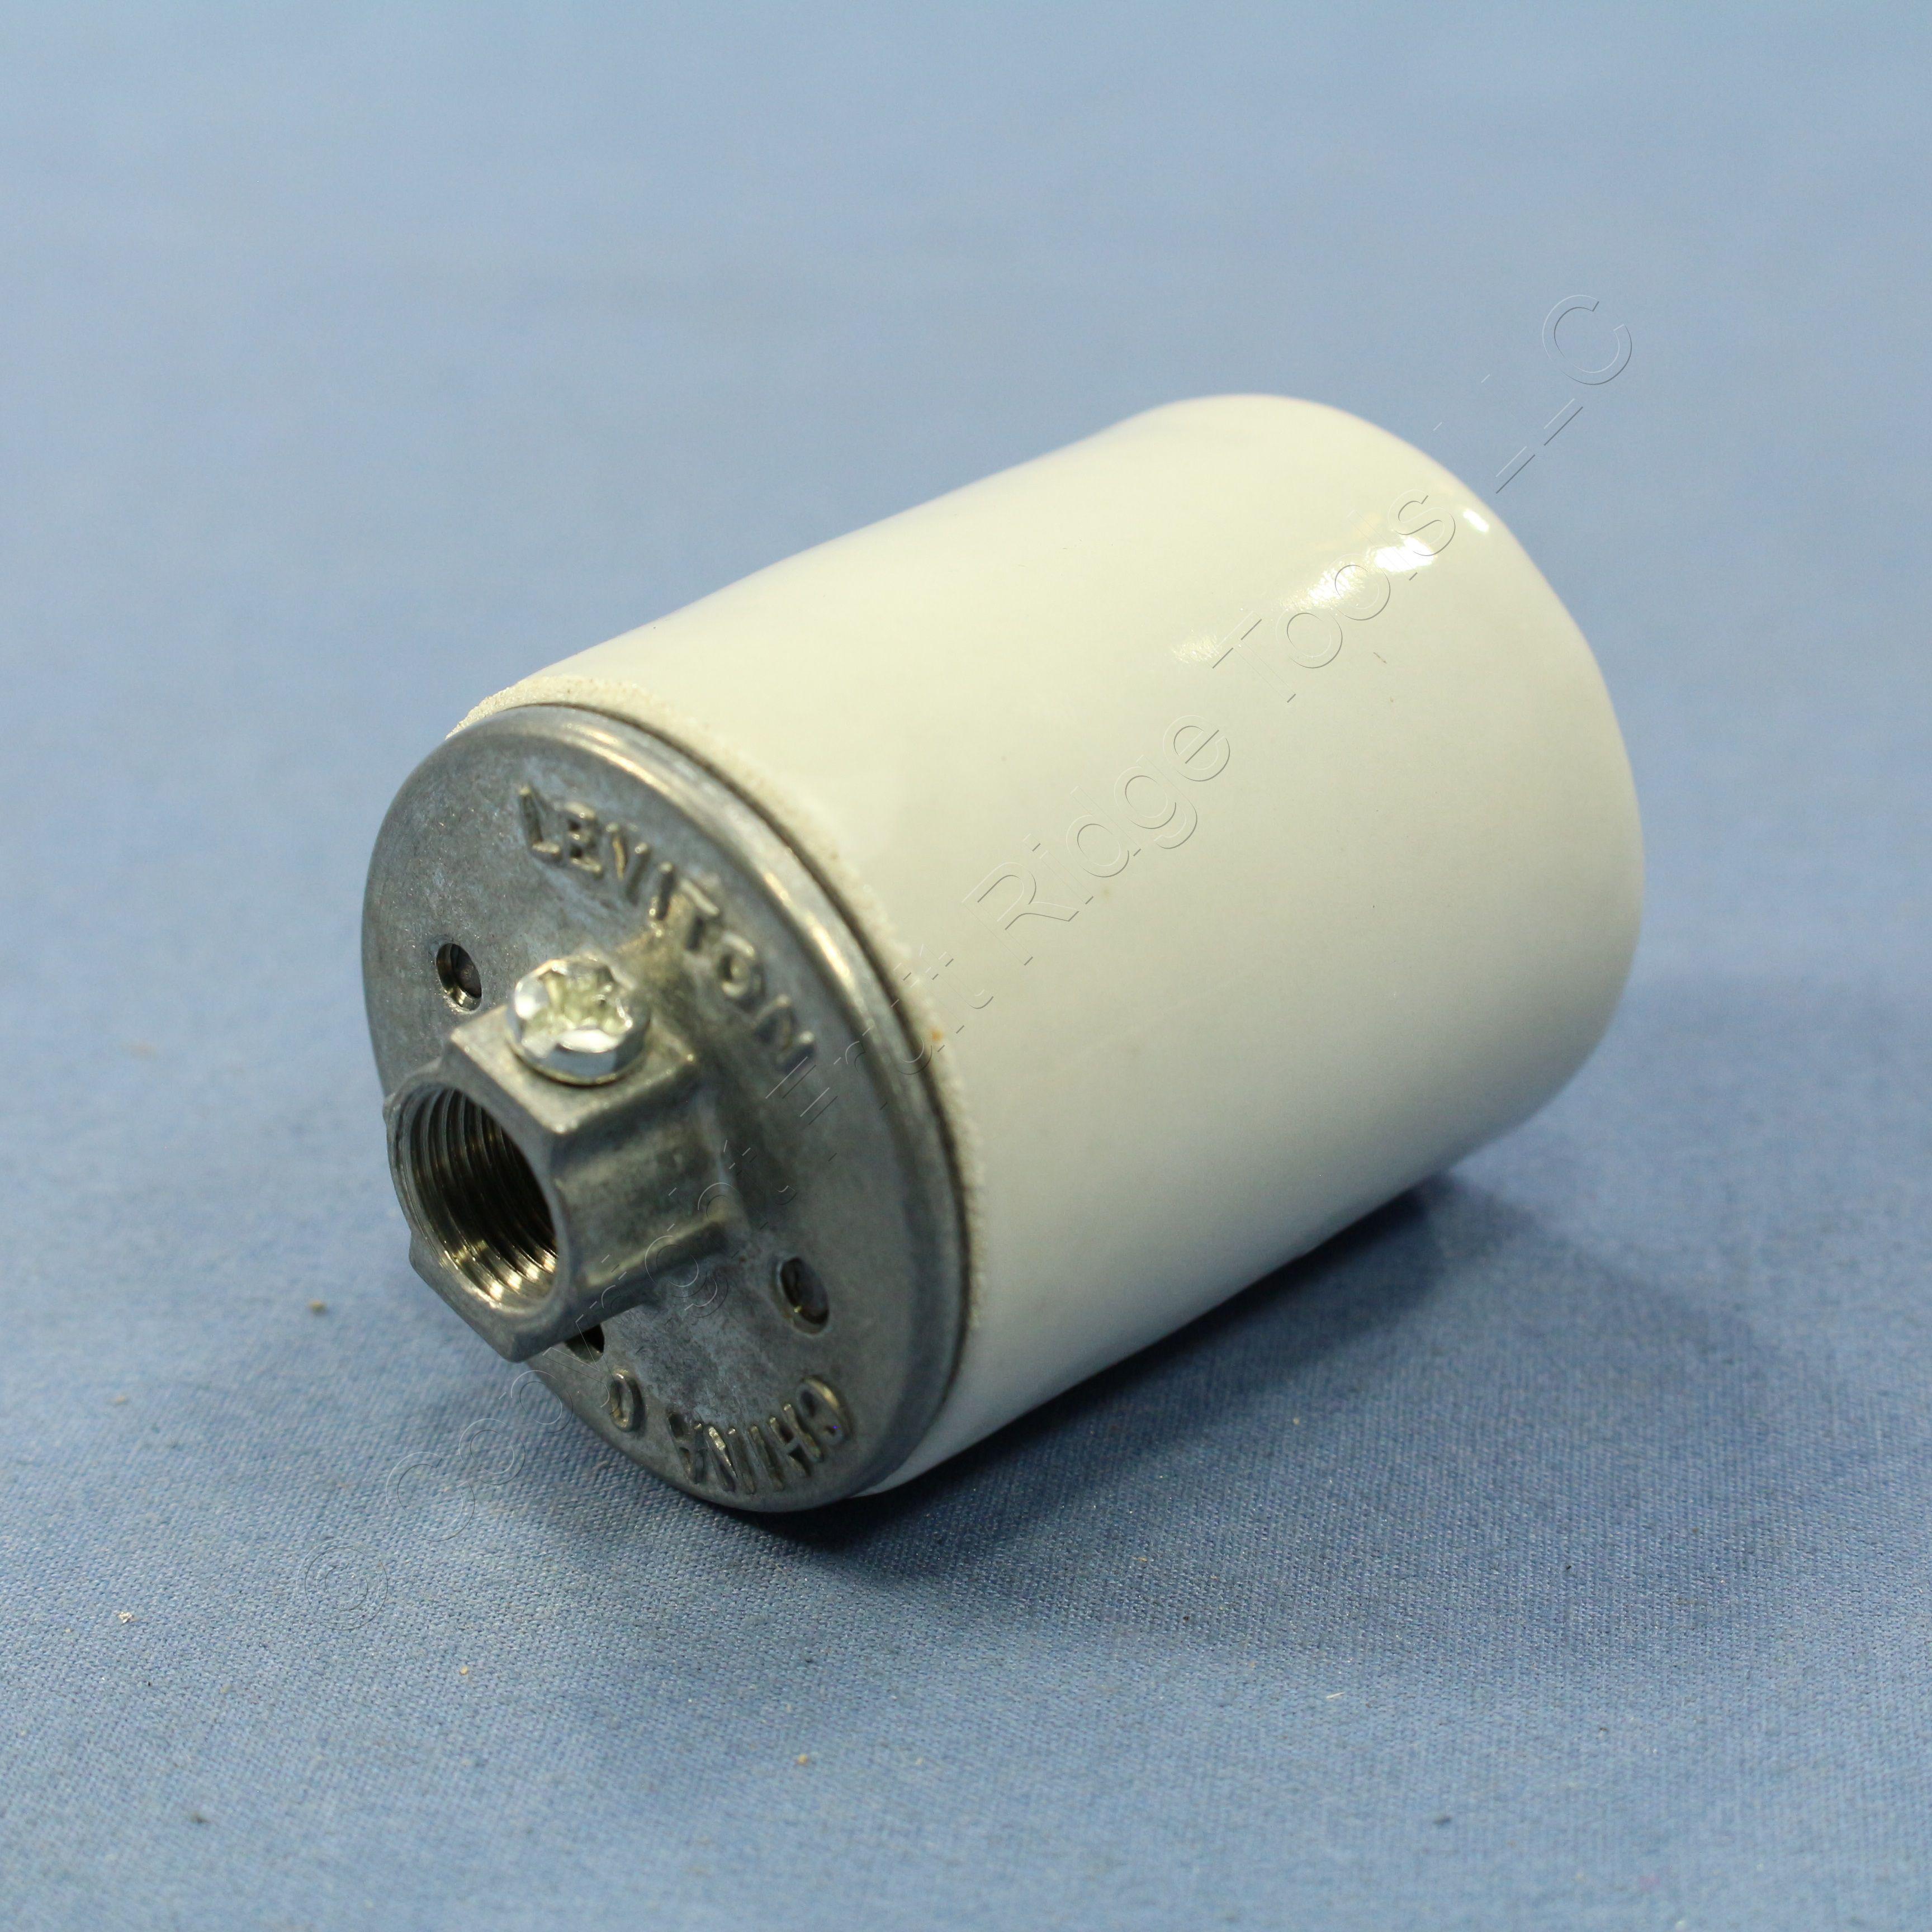 Ceramic Light Socket : Leviton medium base porcelain lamp holders light socket